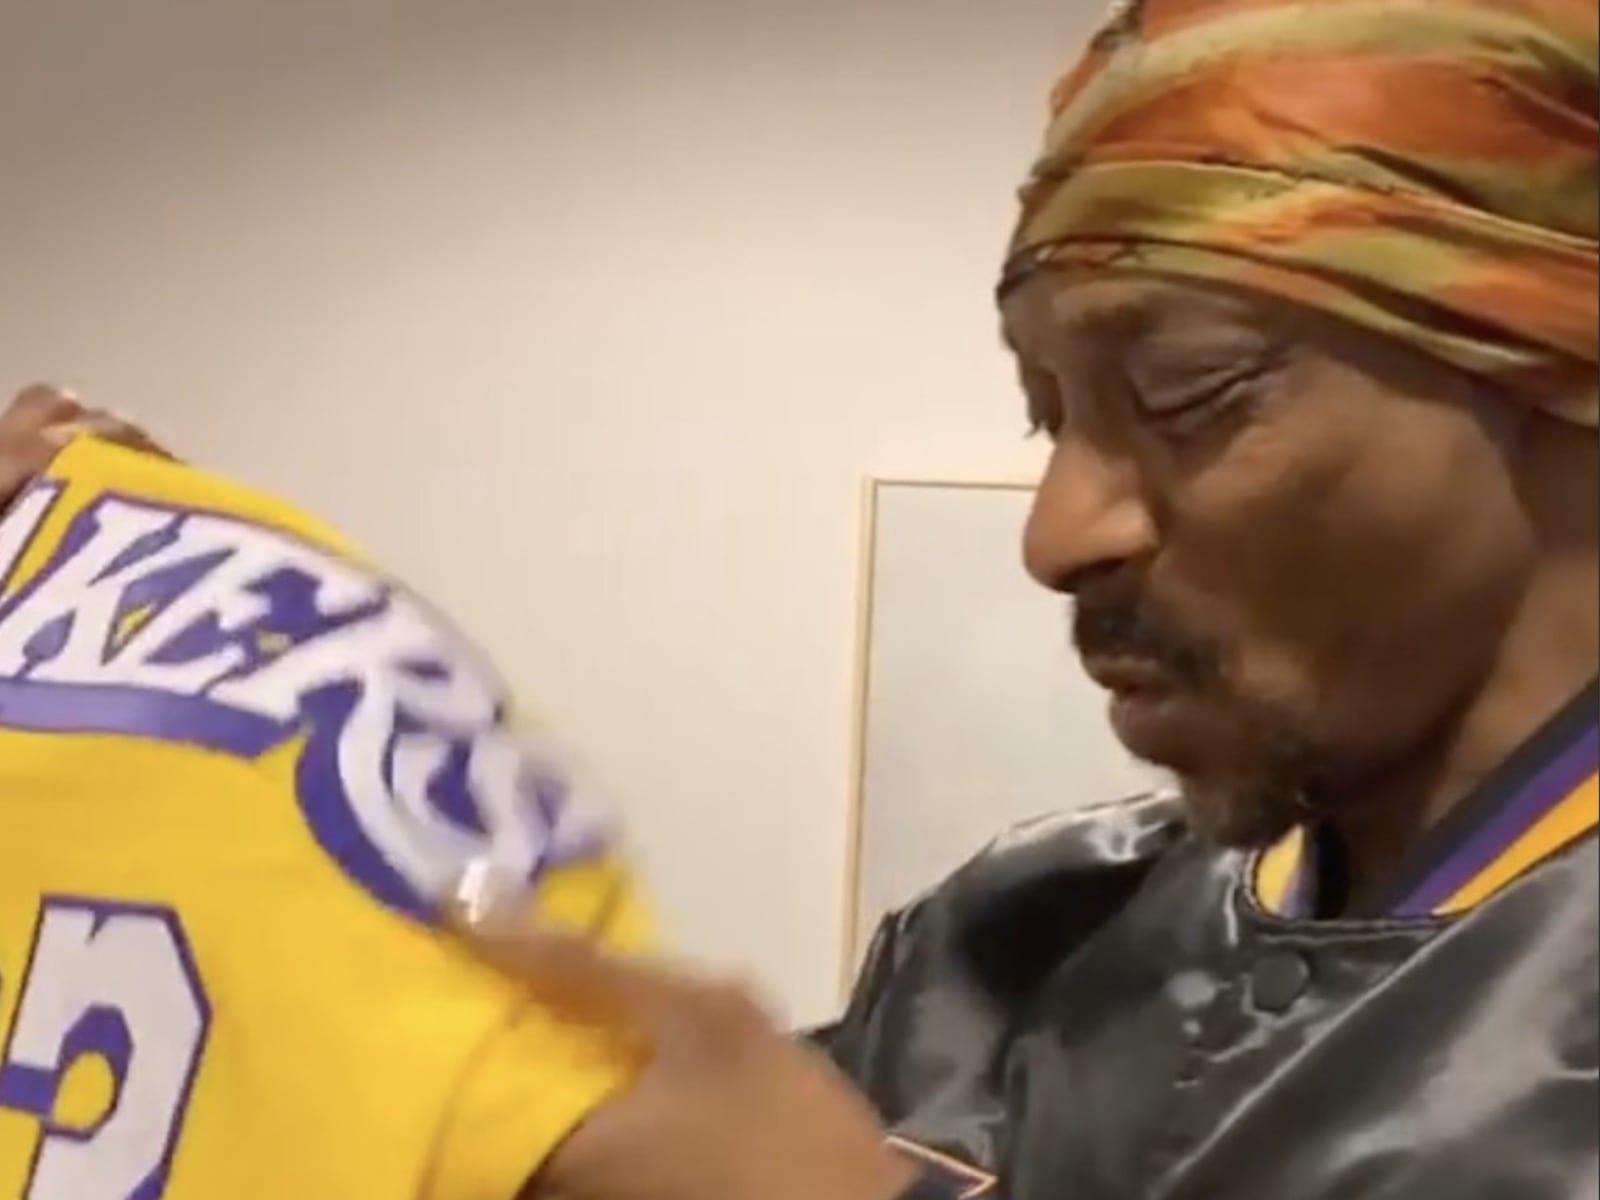 Snoop Dogg LA Lakers Swag